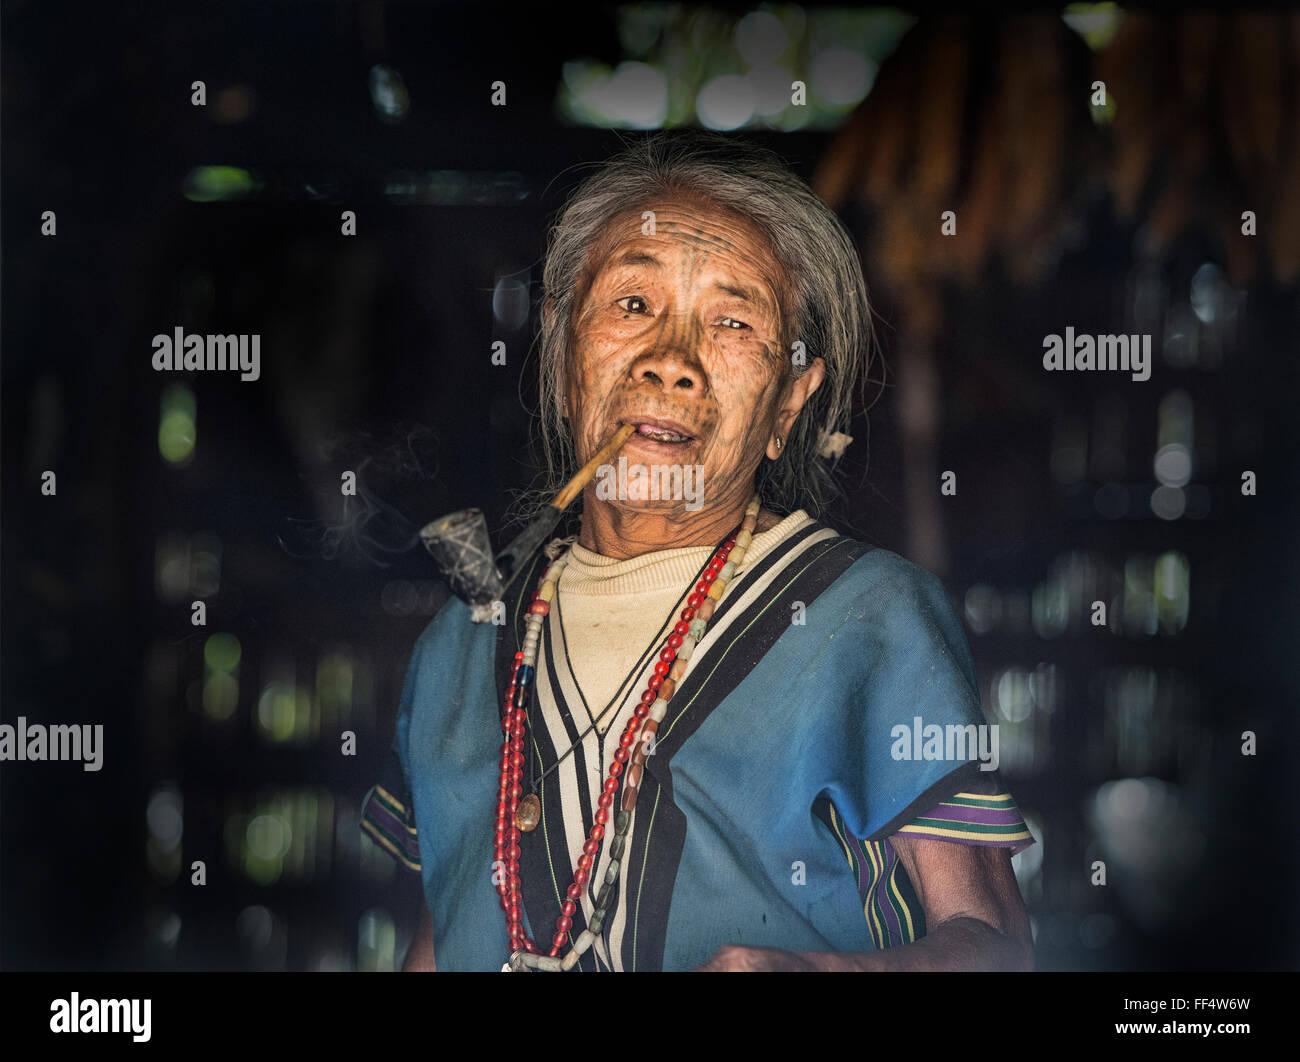 A Muun Chin woman with face tattoos smoking a corncob pipe, Kyar Daw, Mindat, Myanmar. - Stock Image